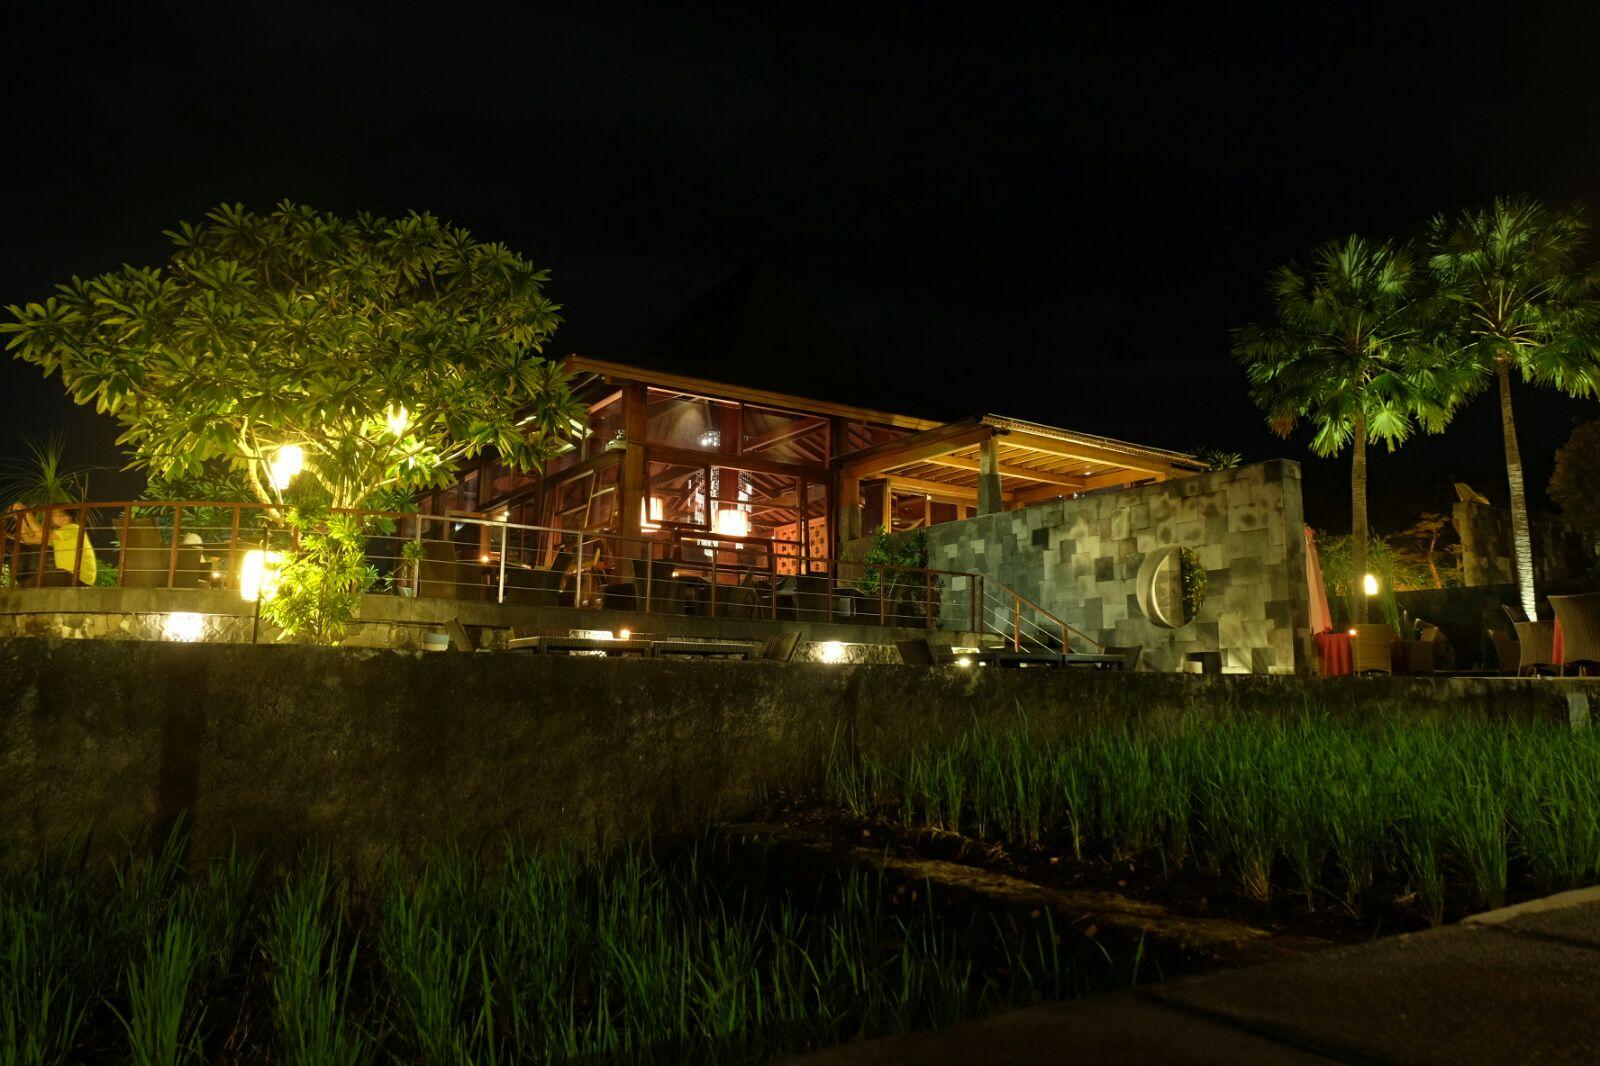 Abhayagiri Restoran Eksotis Malam Hari Di Jogja Di Atas Bukit